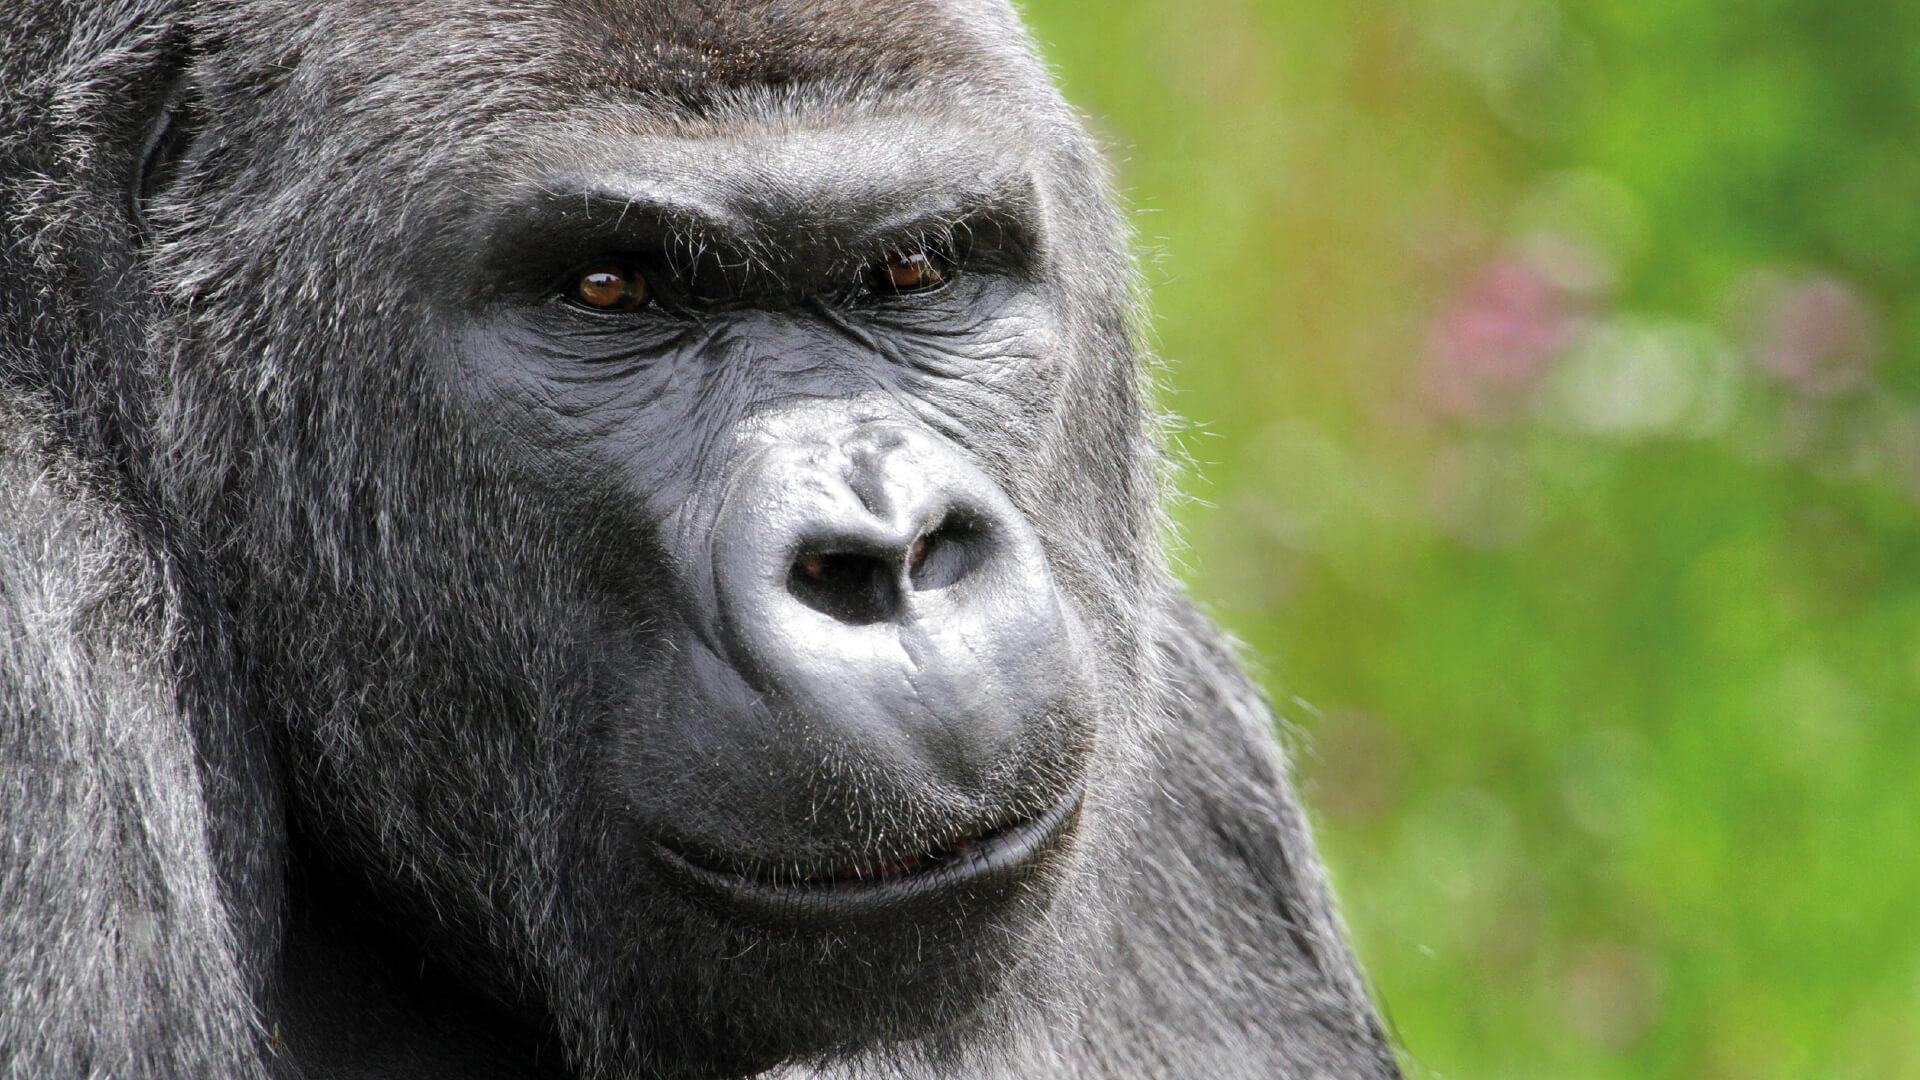 Jock the silverback gorilla at Bristol Zoo Gardens